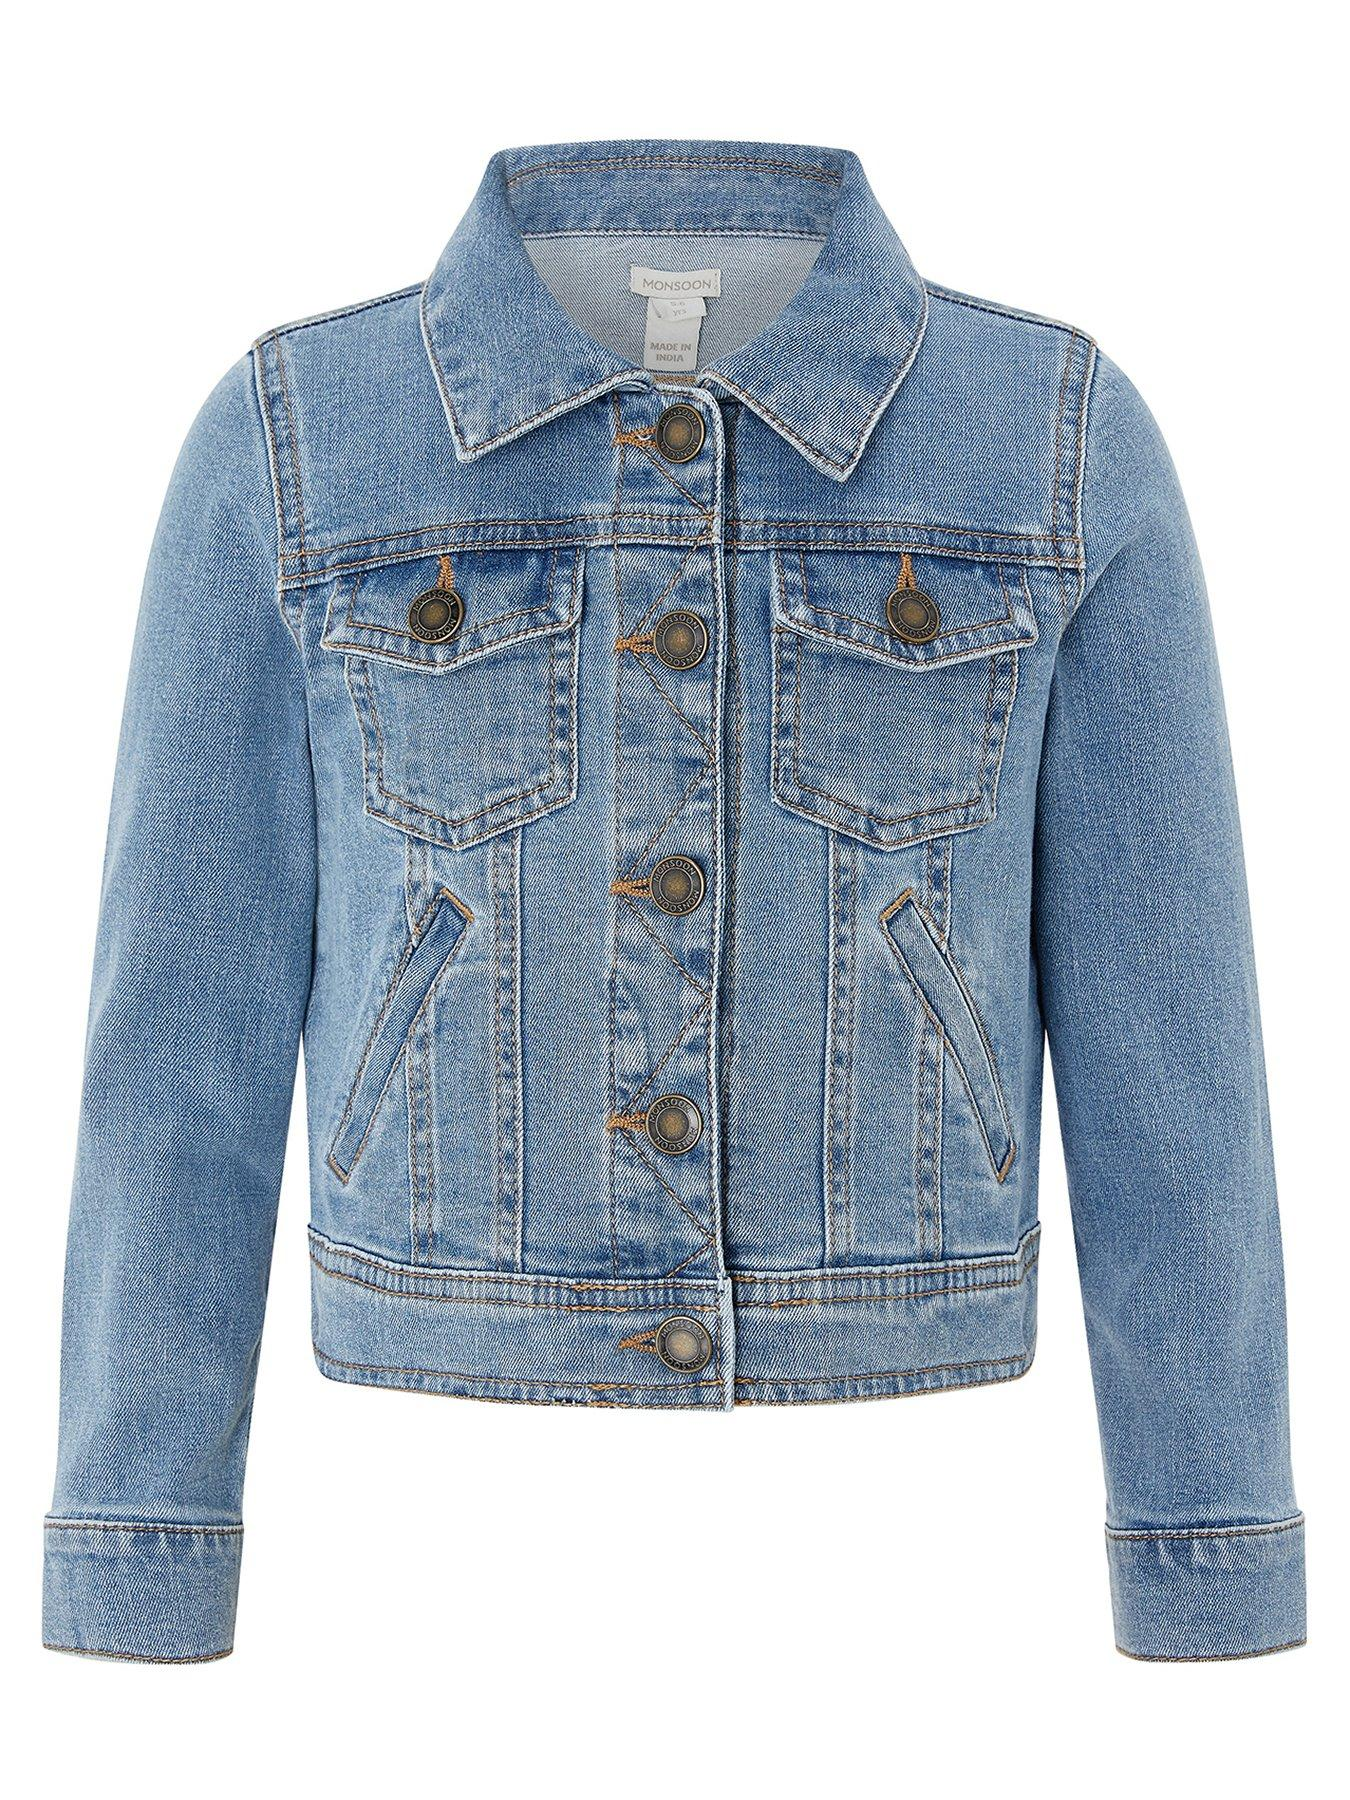 3-6mths Next Baby Girls Royal Blue Button Up Thin Coat Star Lining Coats, Jackets & Snowsuits